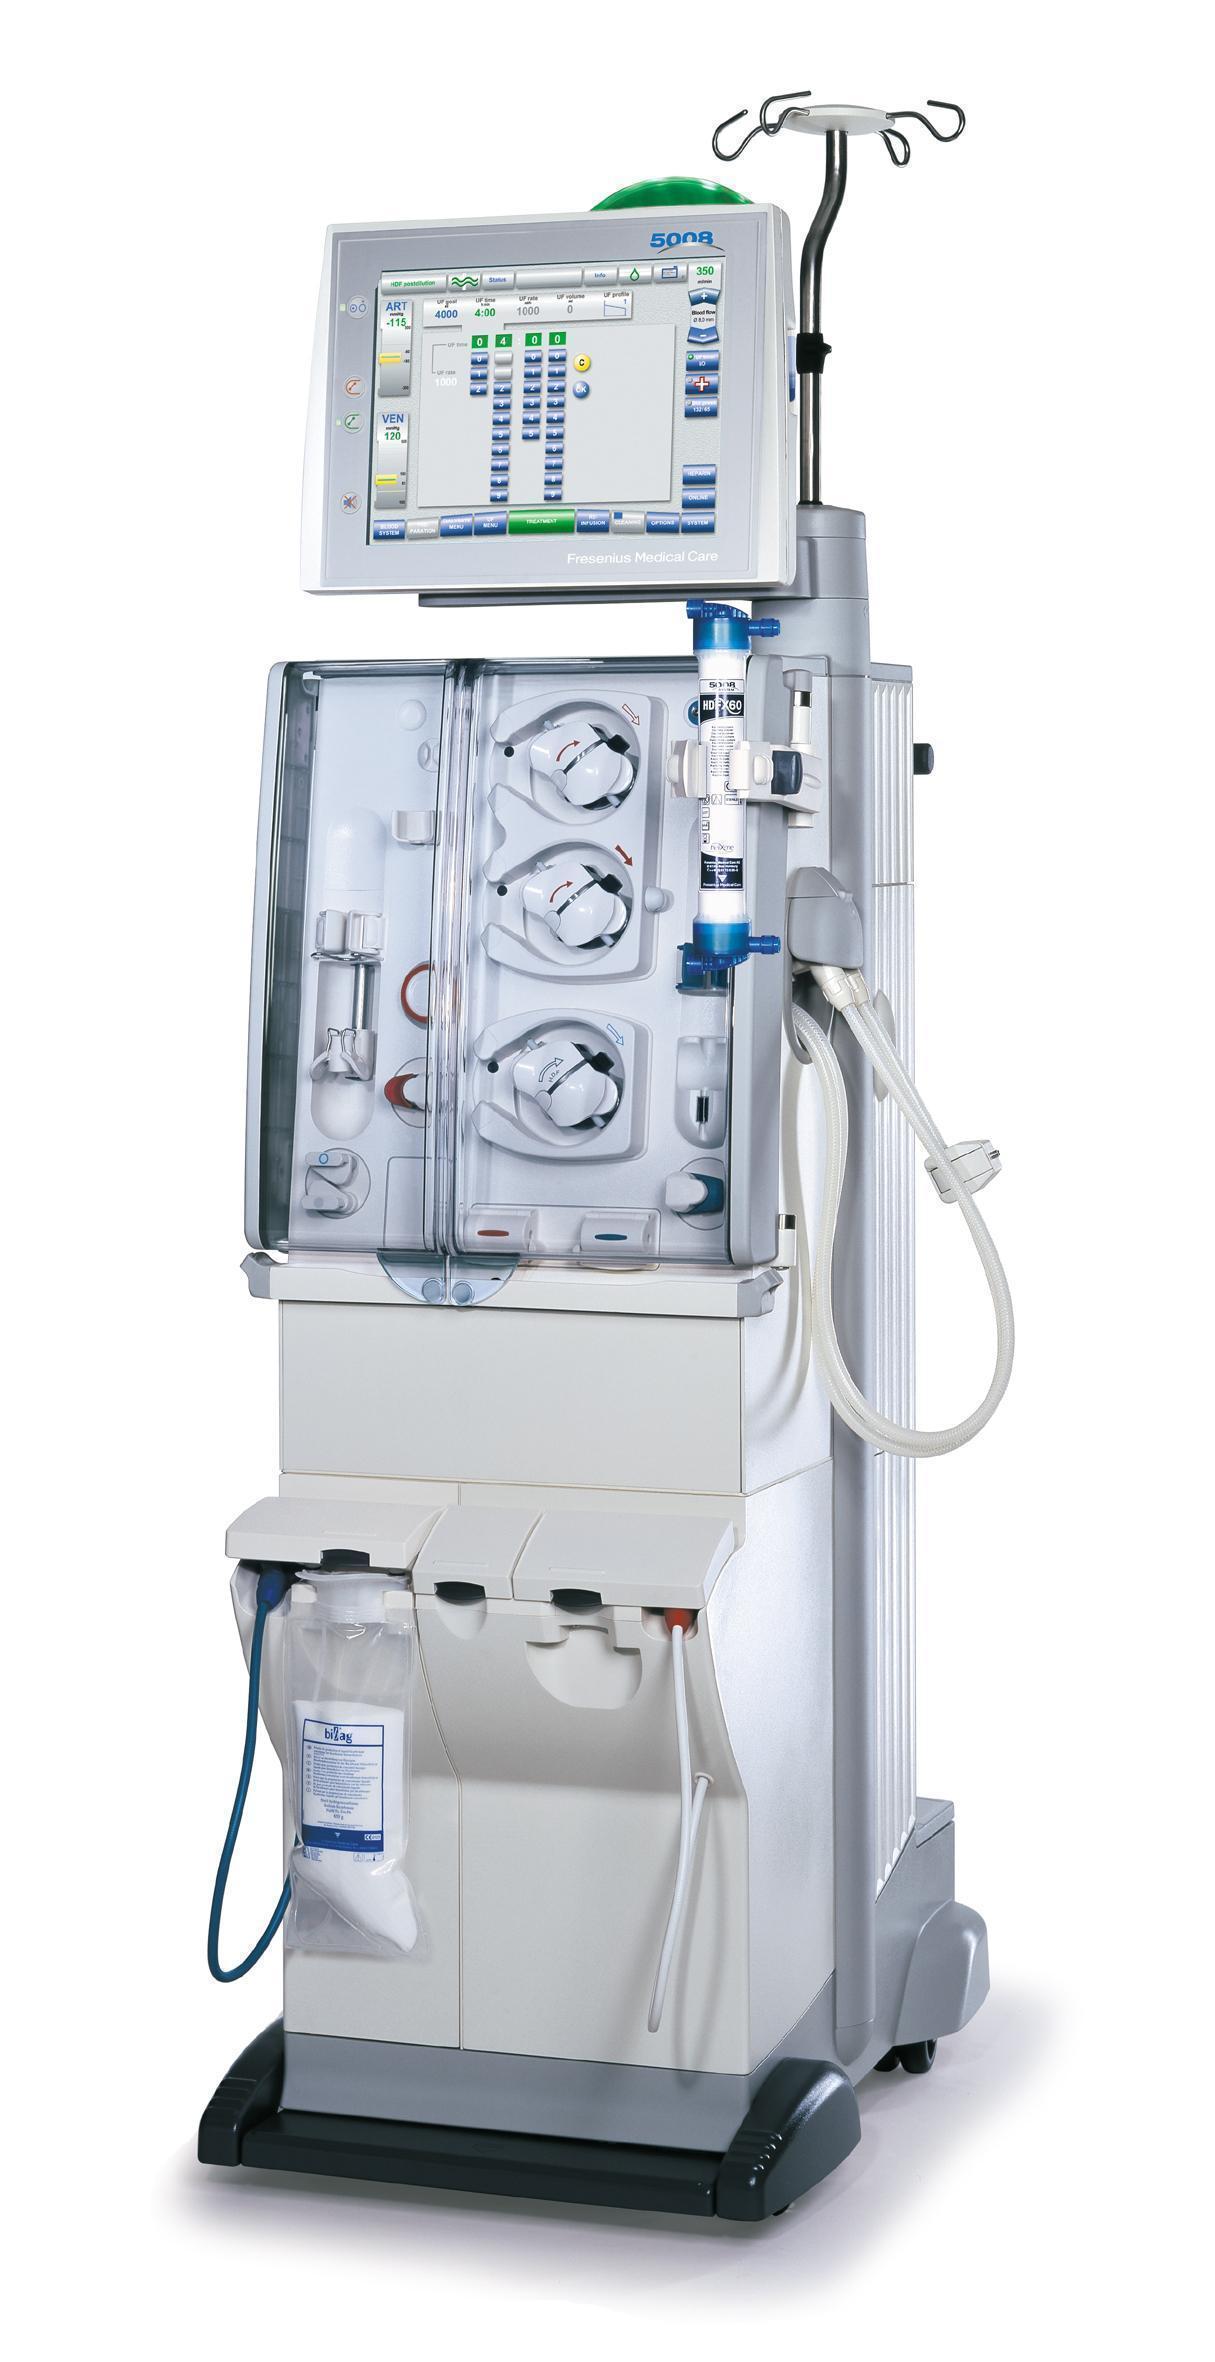 FRESENIUS 5008S Stationary Dialysis Machine